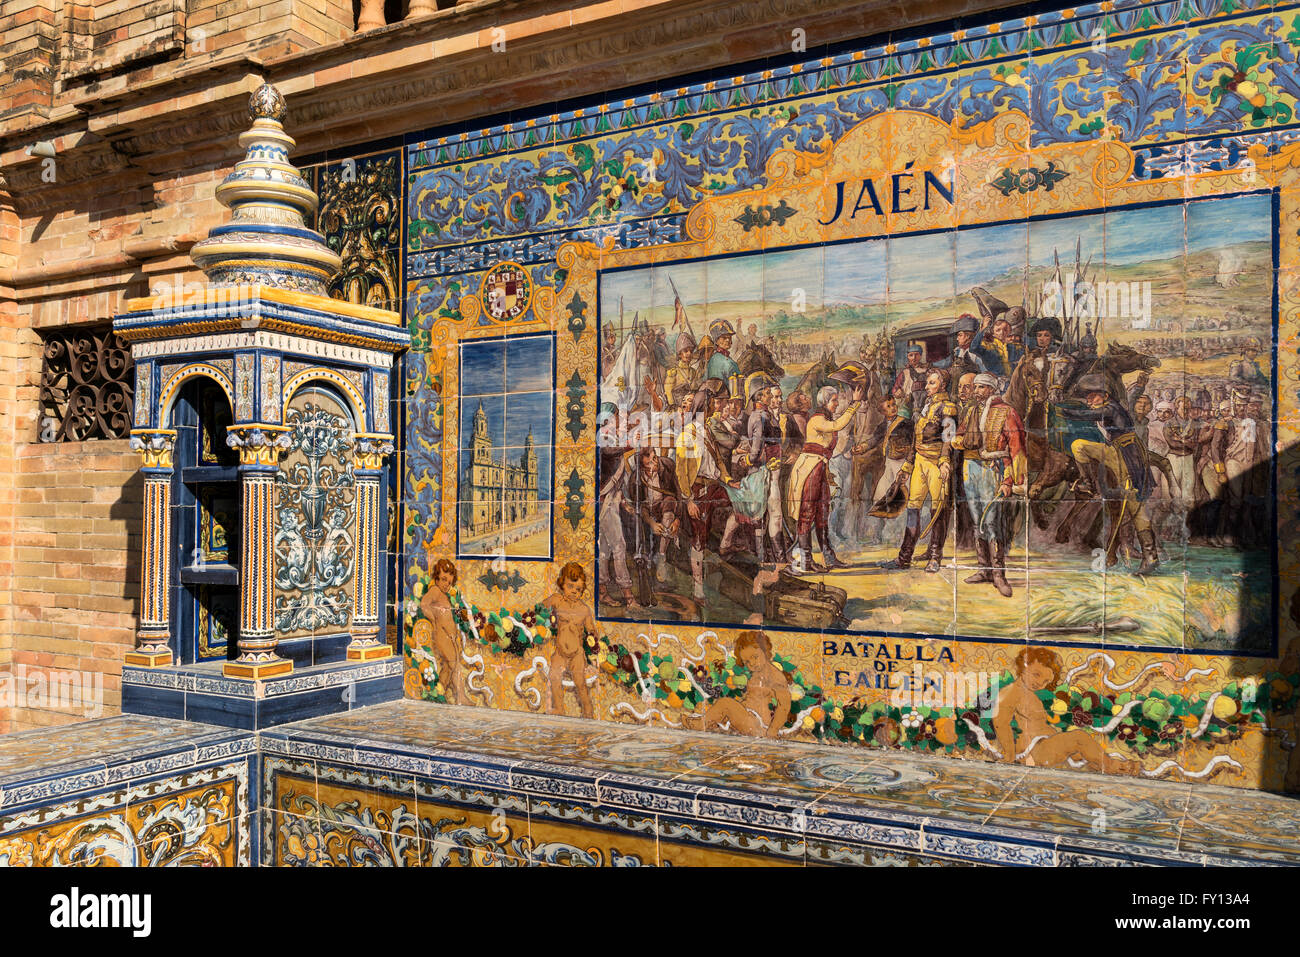 Antique ceramic, wall tiles representing provinces and cities of Spain , Jaen, Placa de Espana, spanish square, - Stock Image